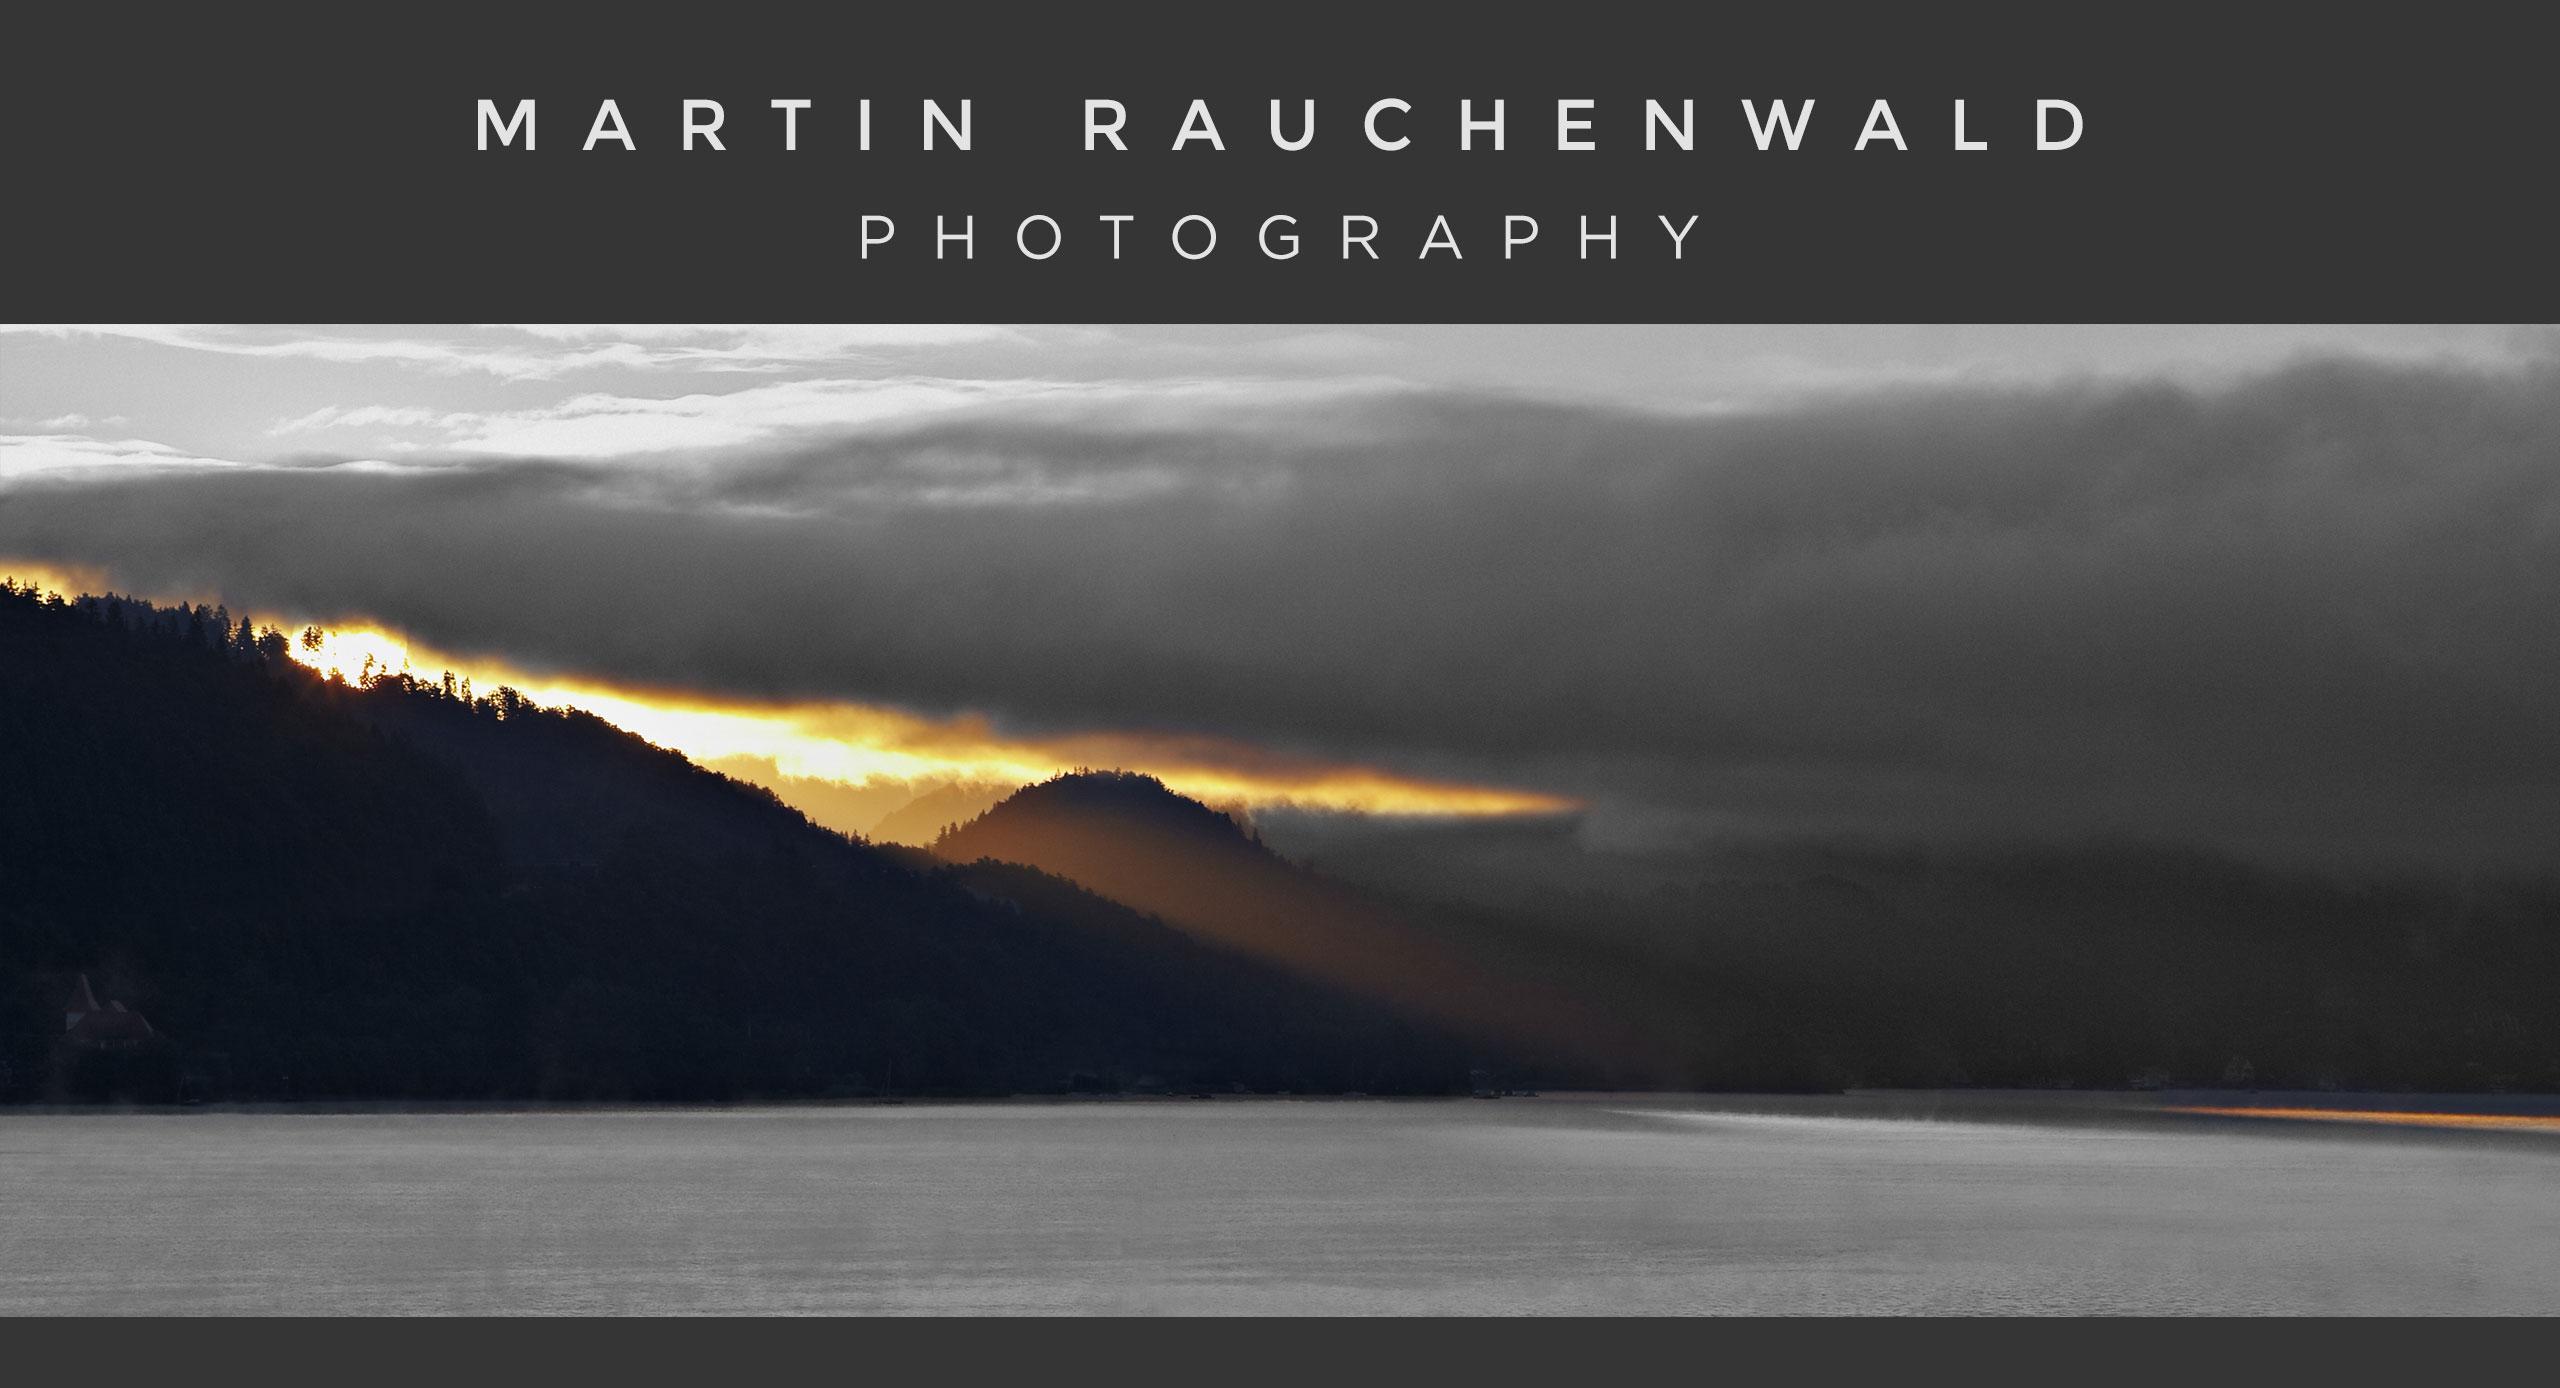 Martin Rauchenwald Photography